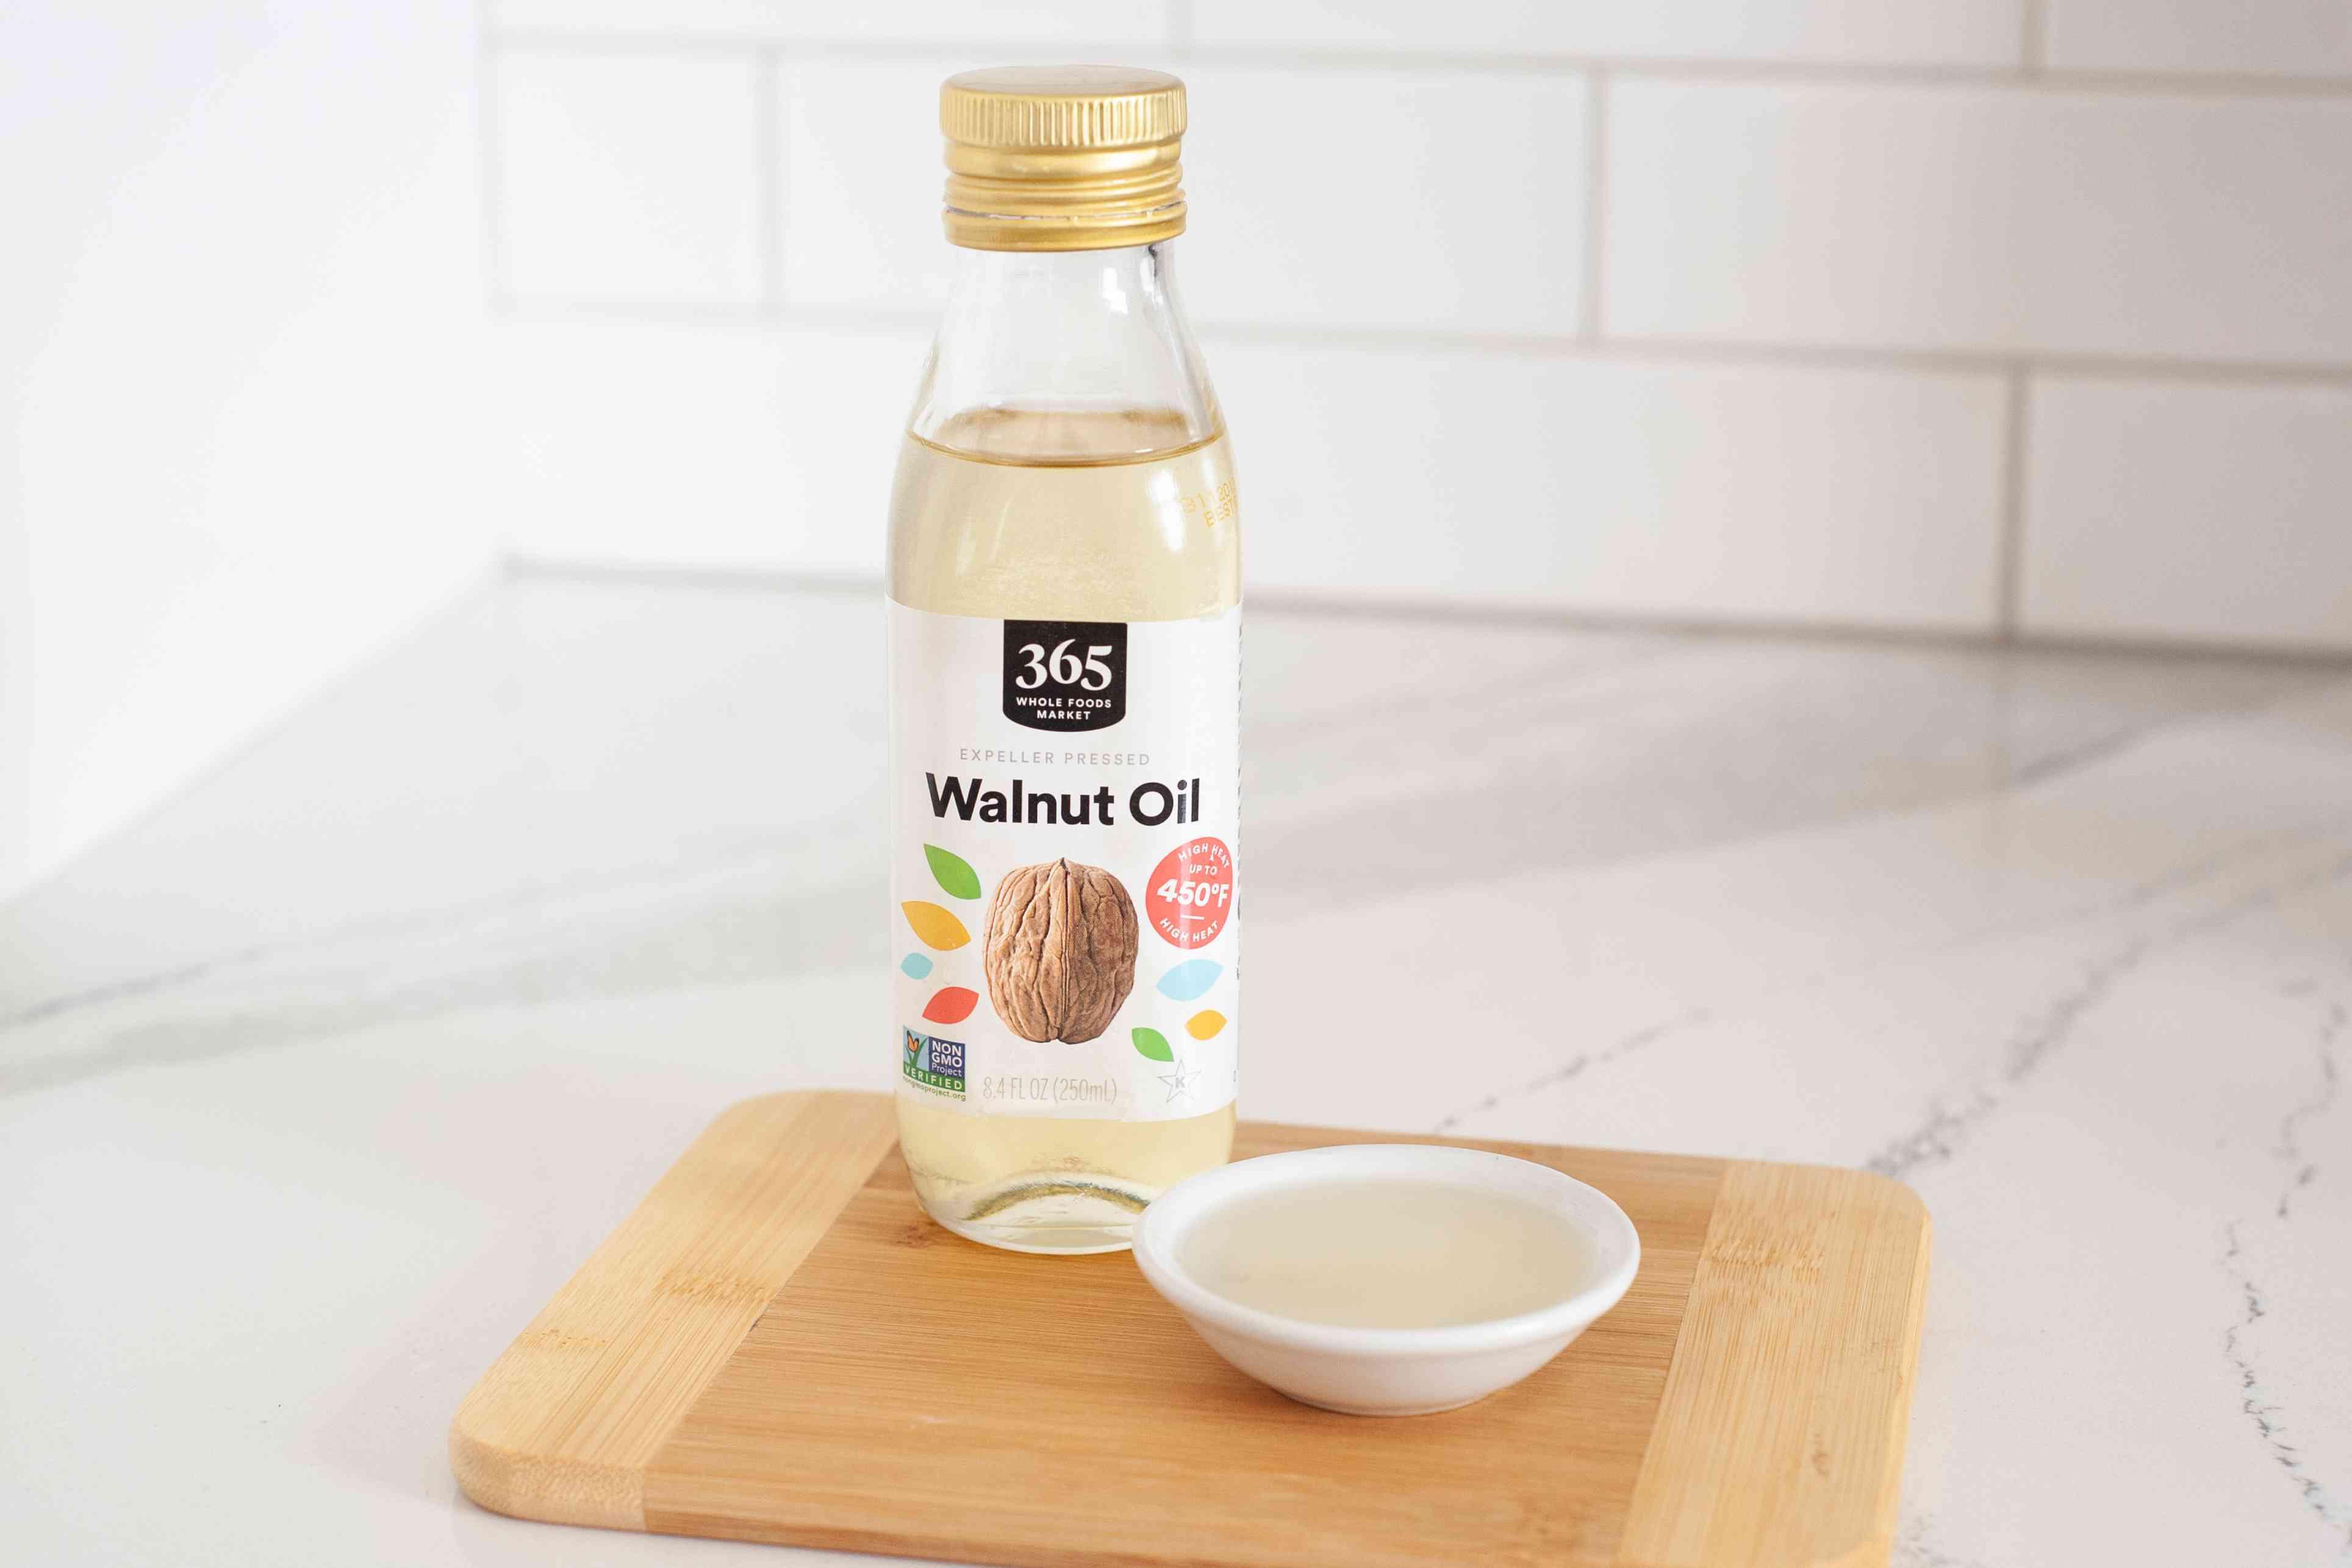 Walnut oil on wood cutting board white background